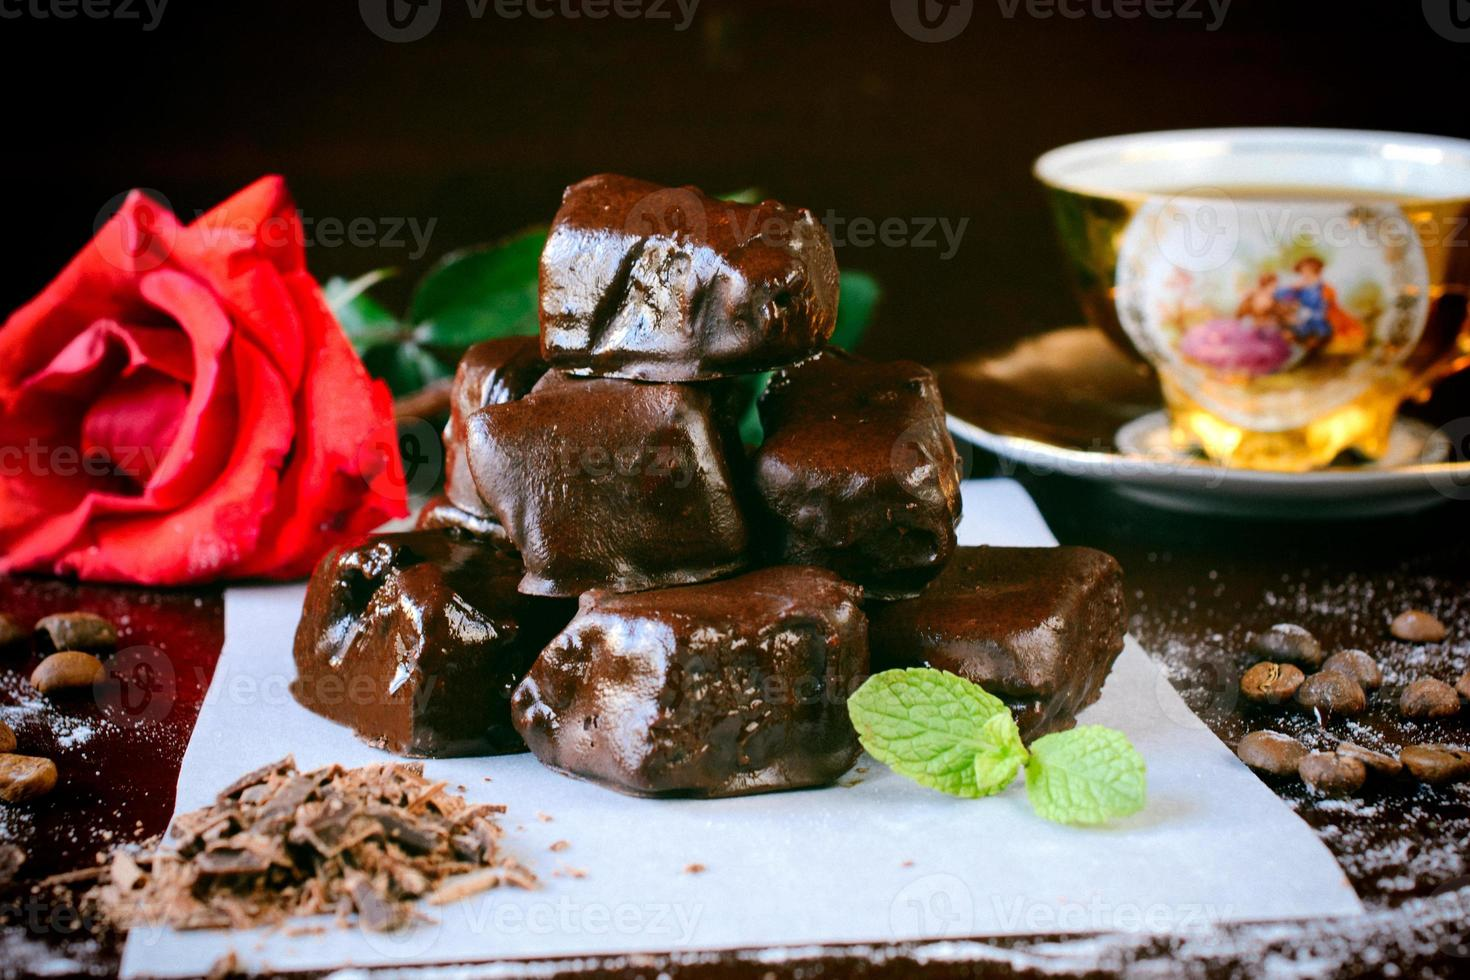 türkischer Schokoladengenuss foto